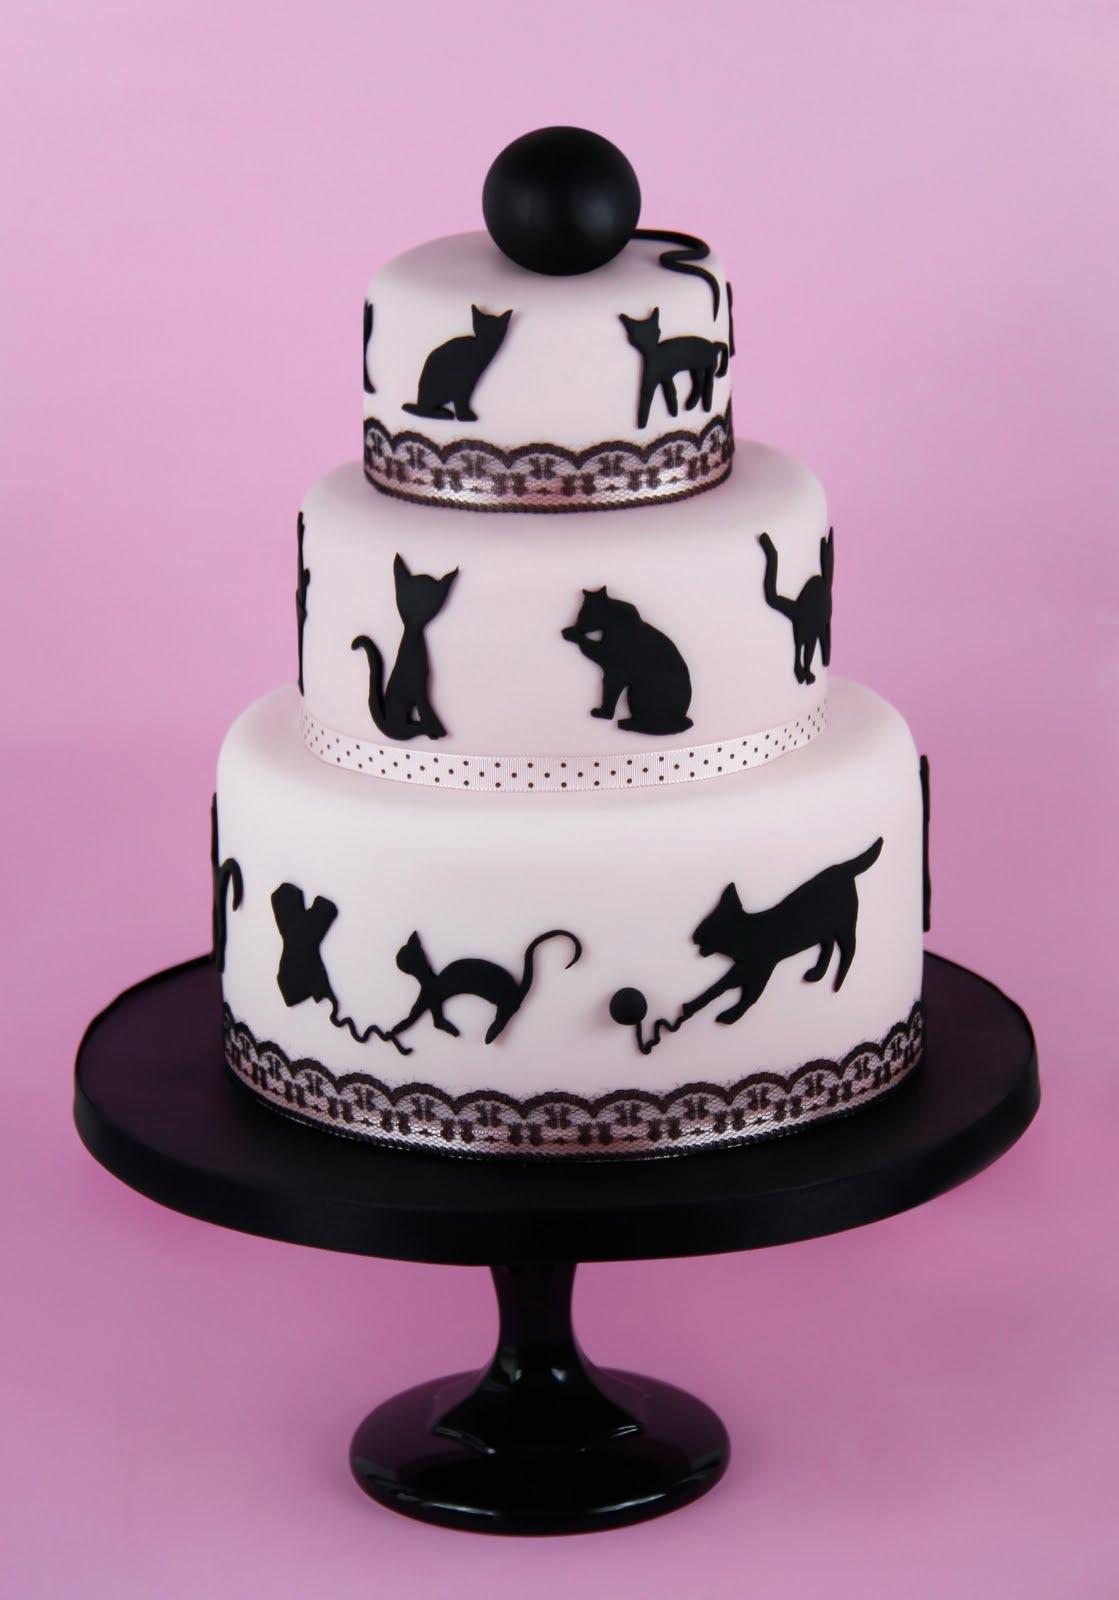 http://1.bp.blogspot.com/-QoWfc-_DZ14/UCbbCWX3OUI/AAAAAAAABA4/PiVxpnlaAzA/s1600/Tarta+fondant+gatos.jpg